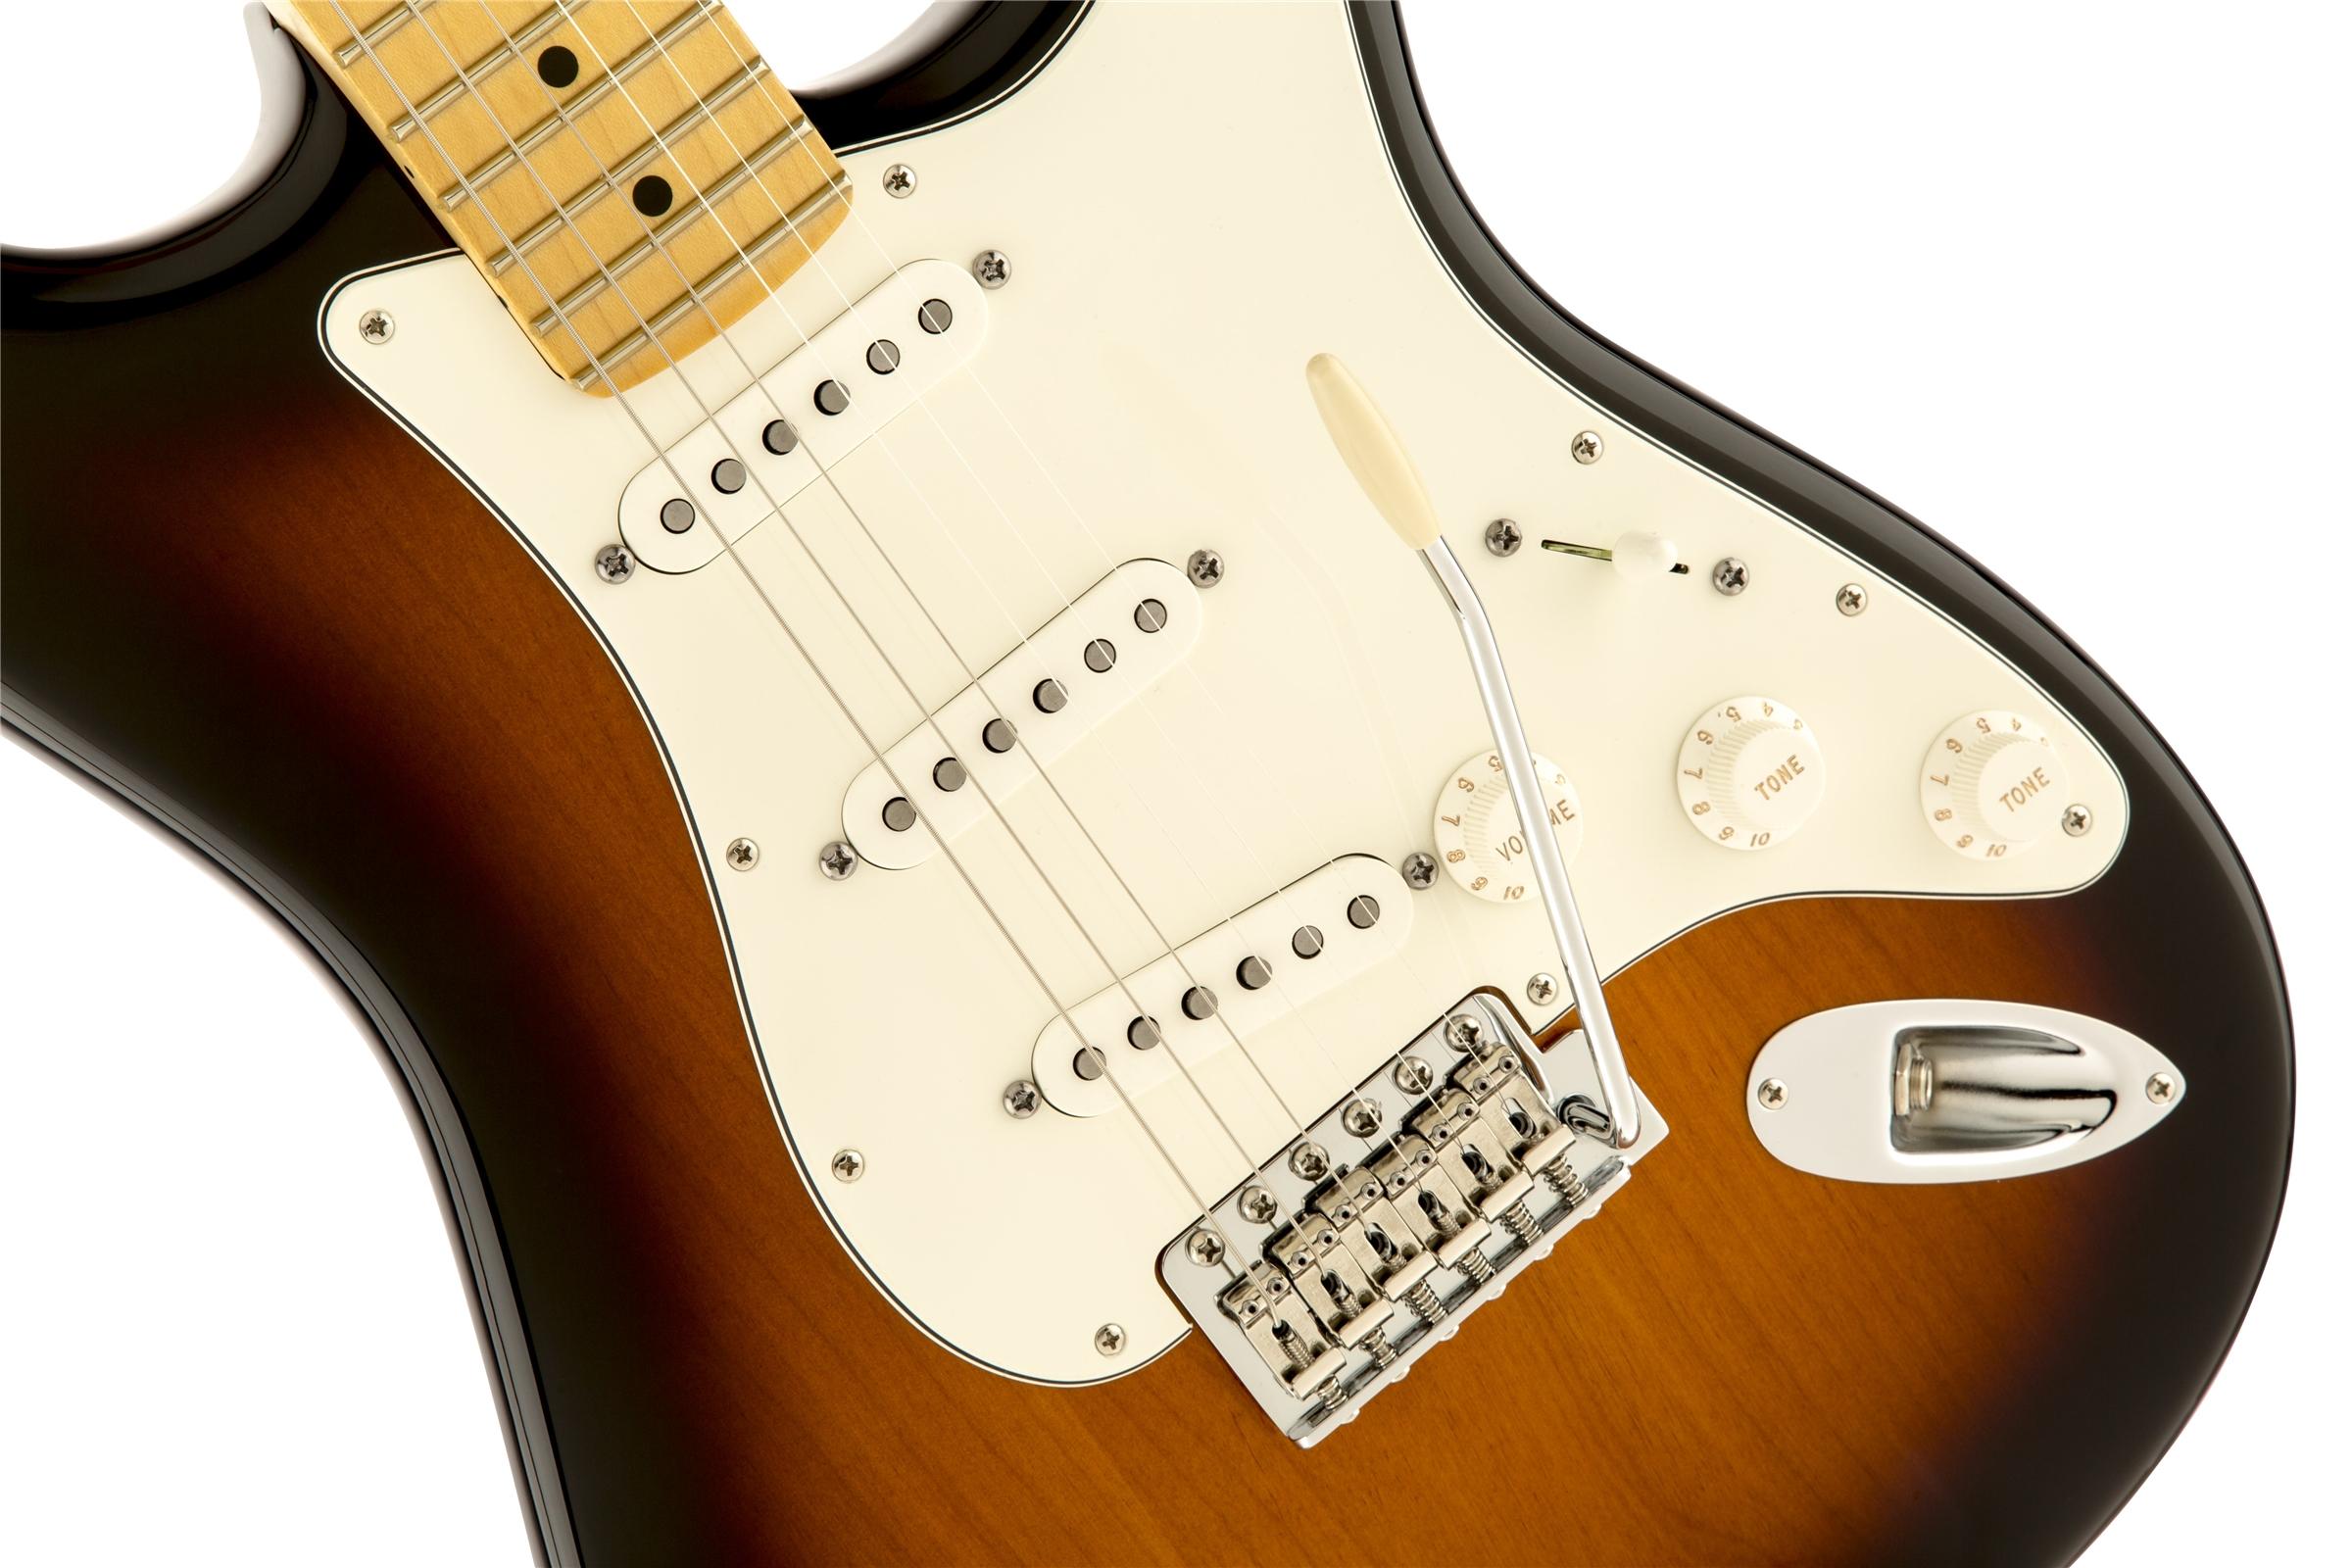 fender american special hss strat wiring diagram fender Fender 5-Way Switch Wiring Strat Humbucker Wiring-Diagram